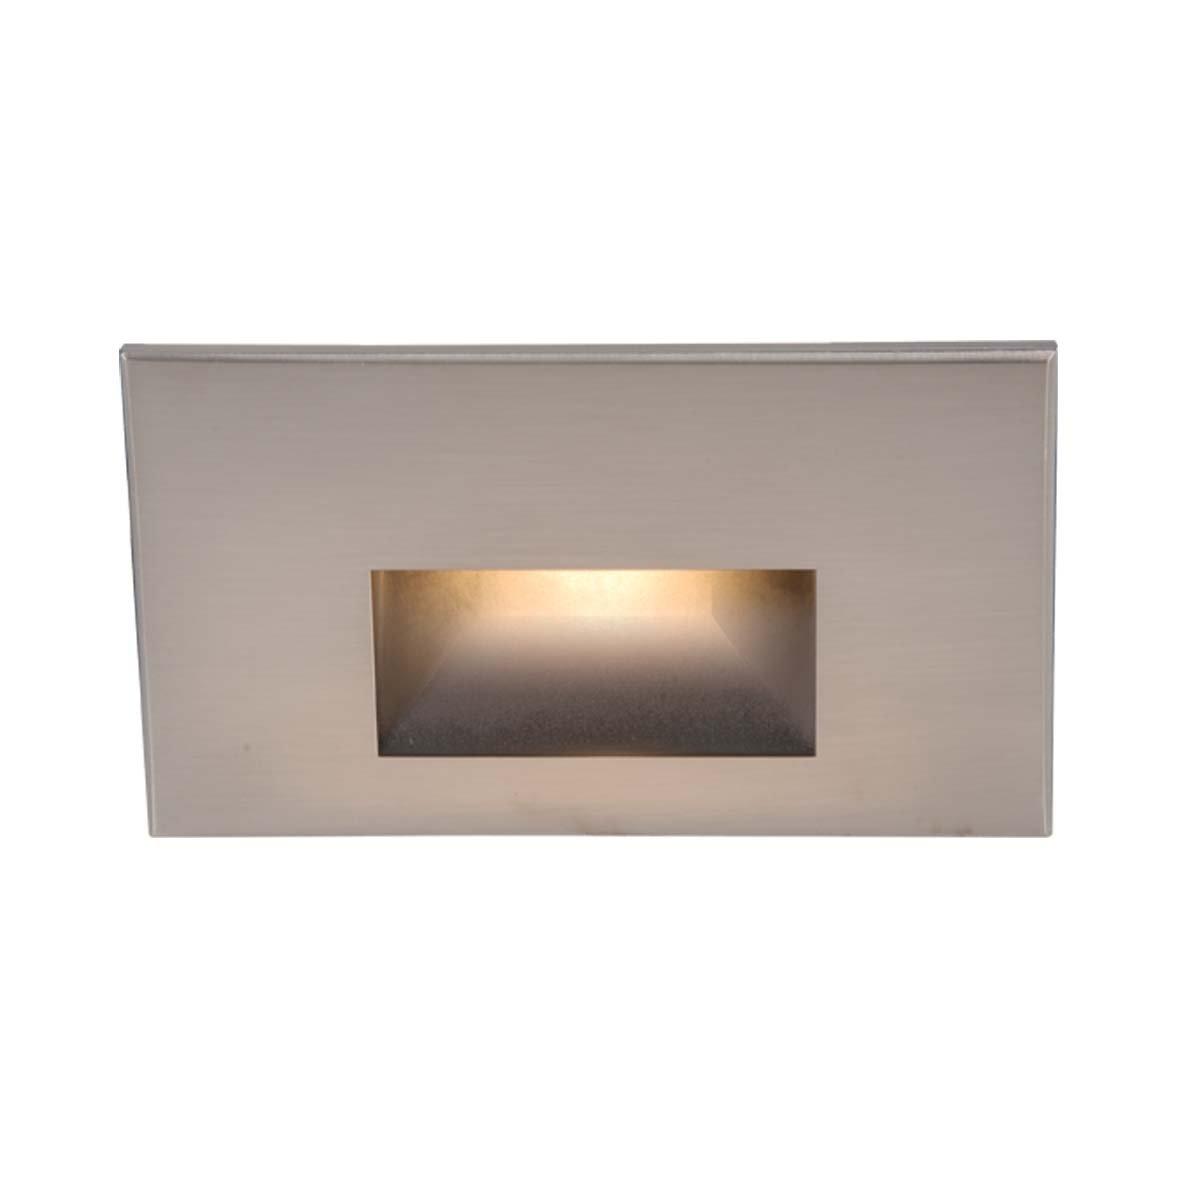 WAC Lighting WL-LED100-C-BN LED Step Light Rectangular Scoop by WAC Lighting